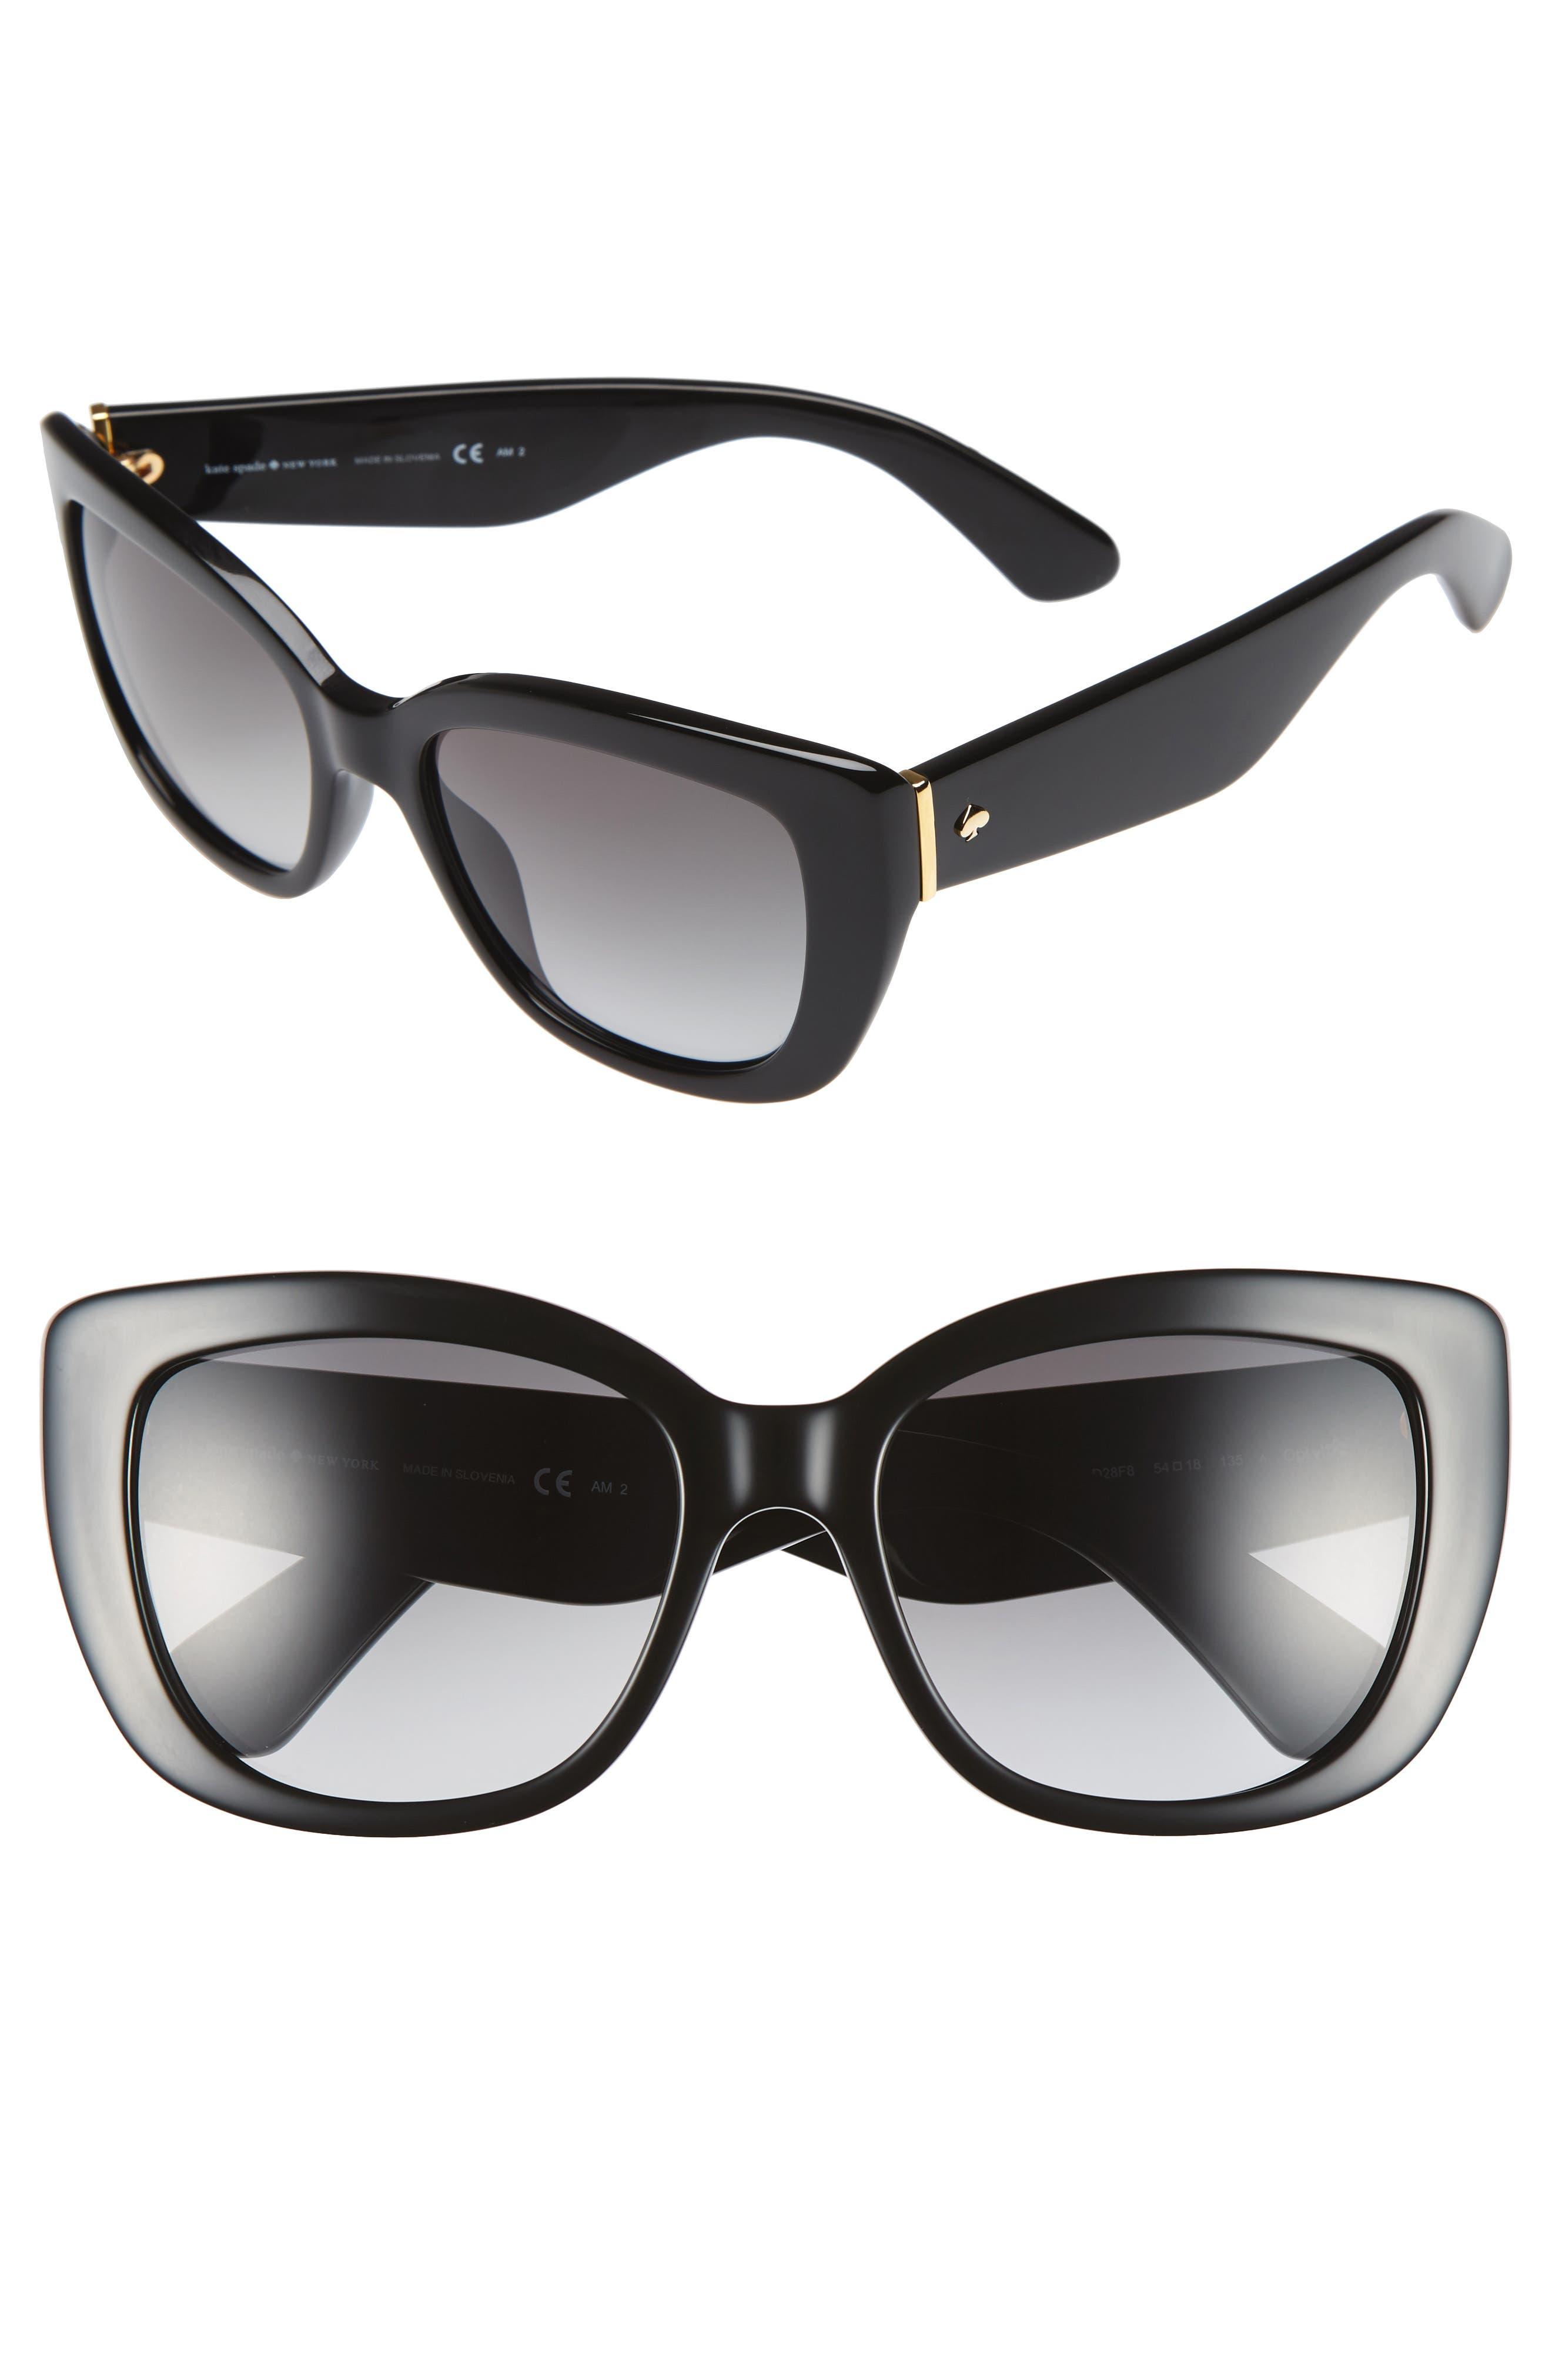 KATE SPADE NEW YORK, 'andris' 54mm sunglasses, Alternate thumbnail 2, color, 001